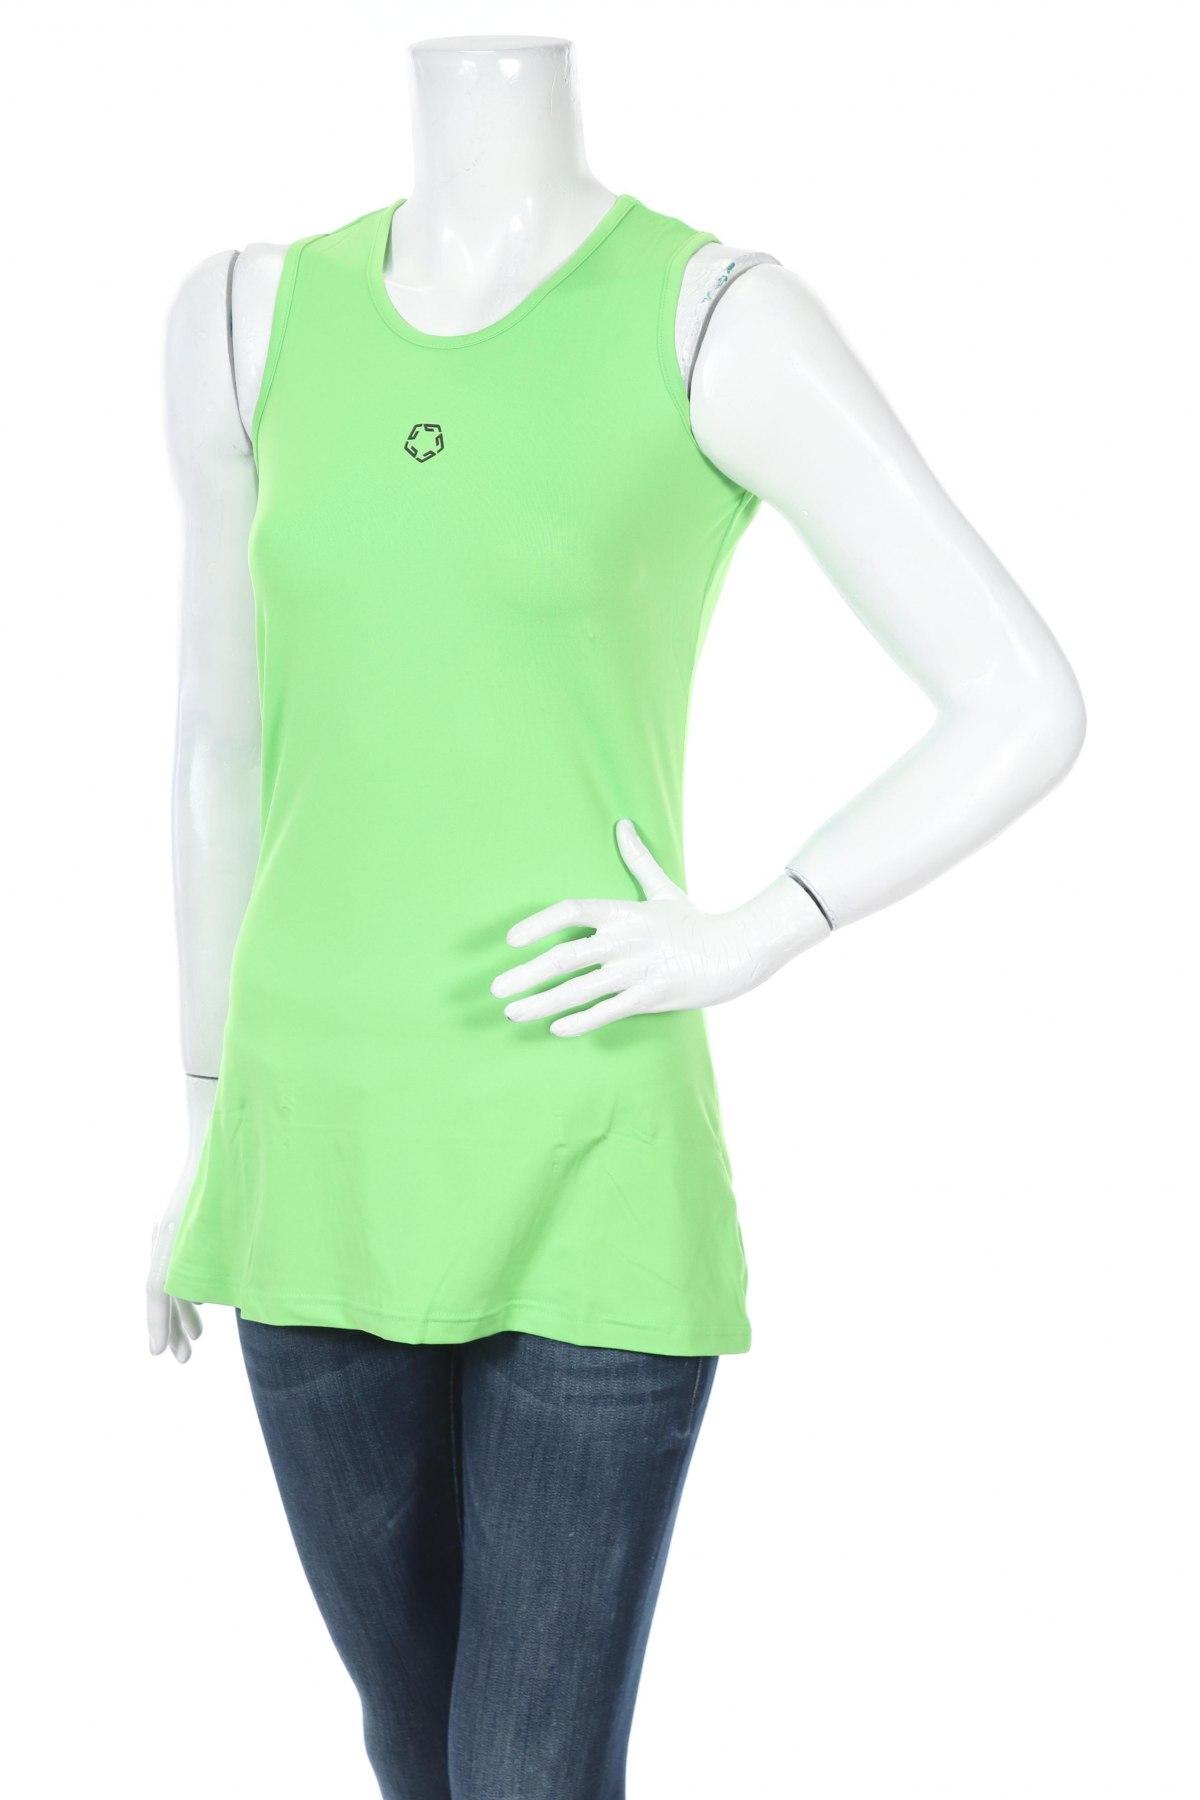 Дамски потник Gregster, Размер M, Цвят Зелен, 88% полиестер, 12% еластан, Цена 3,24лв.